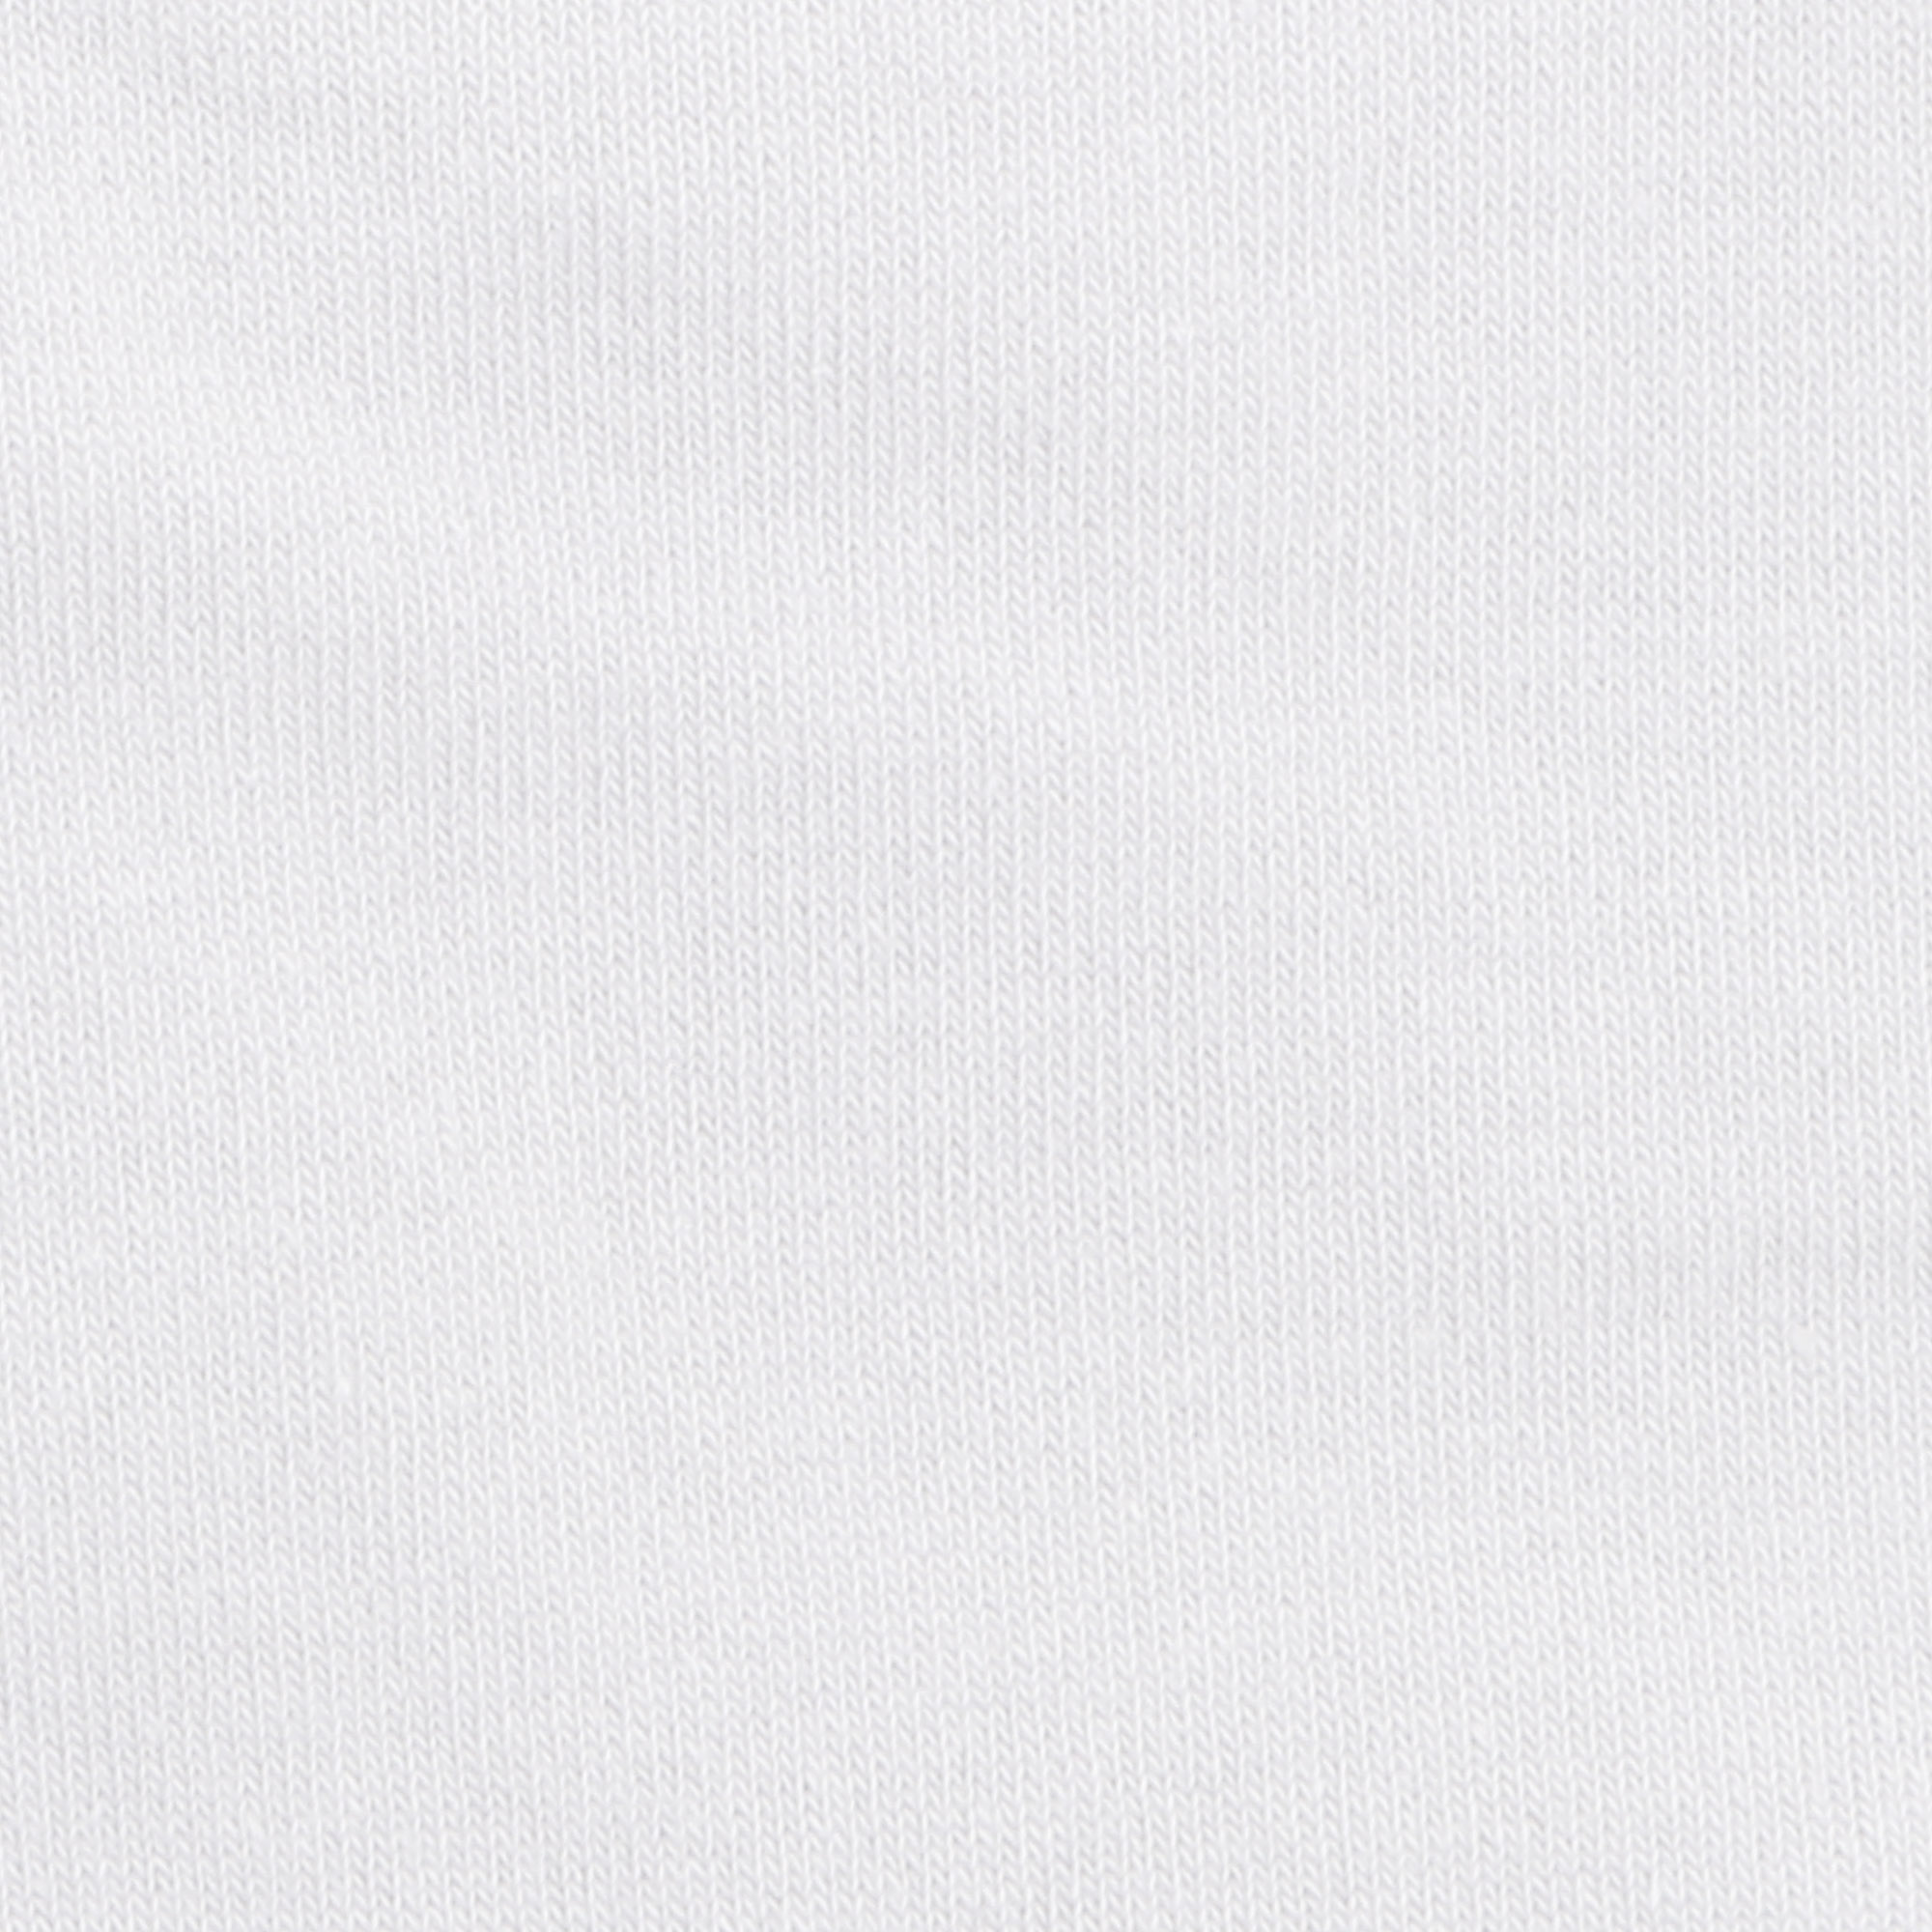 Носки мужские Lucky Socks 29-31 серые 1 пара